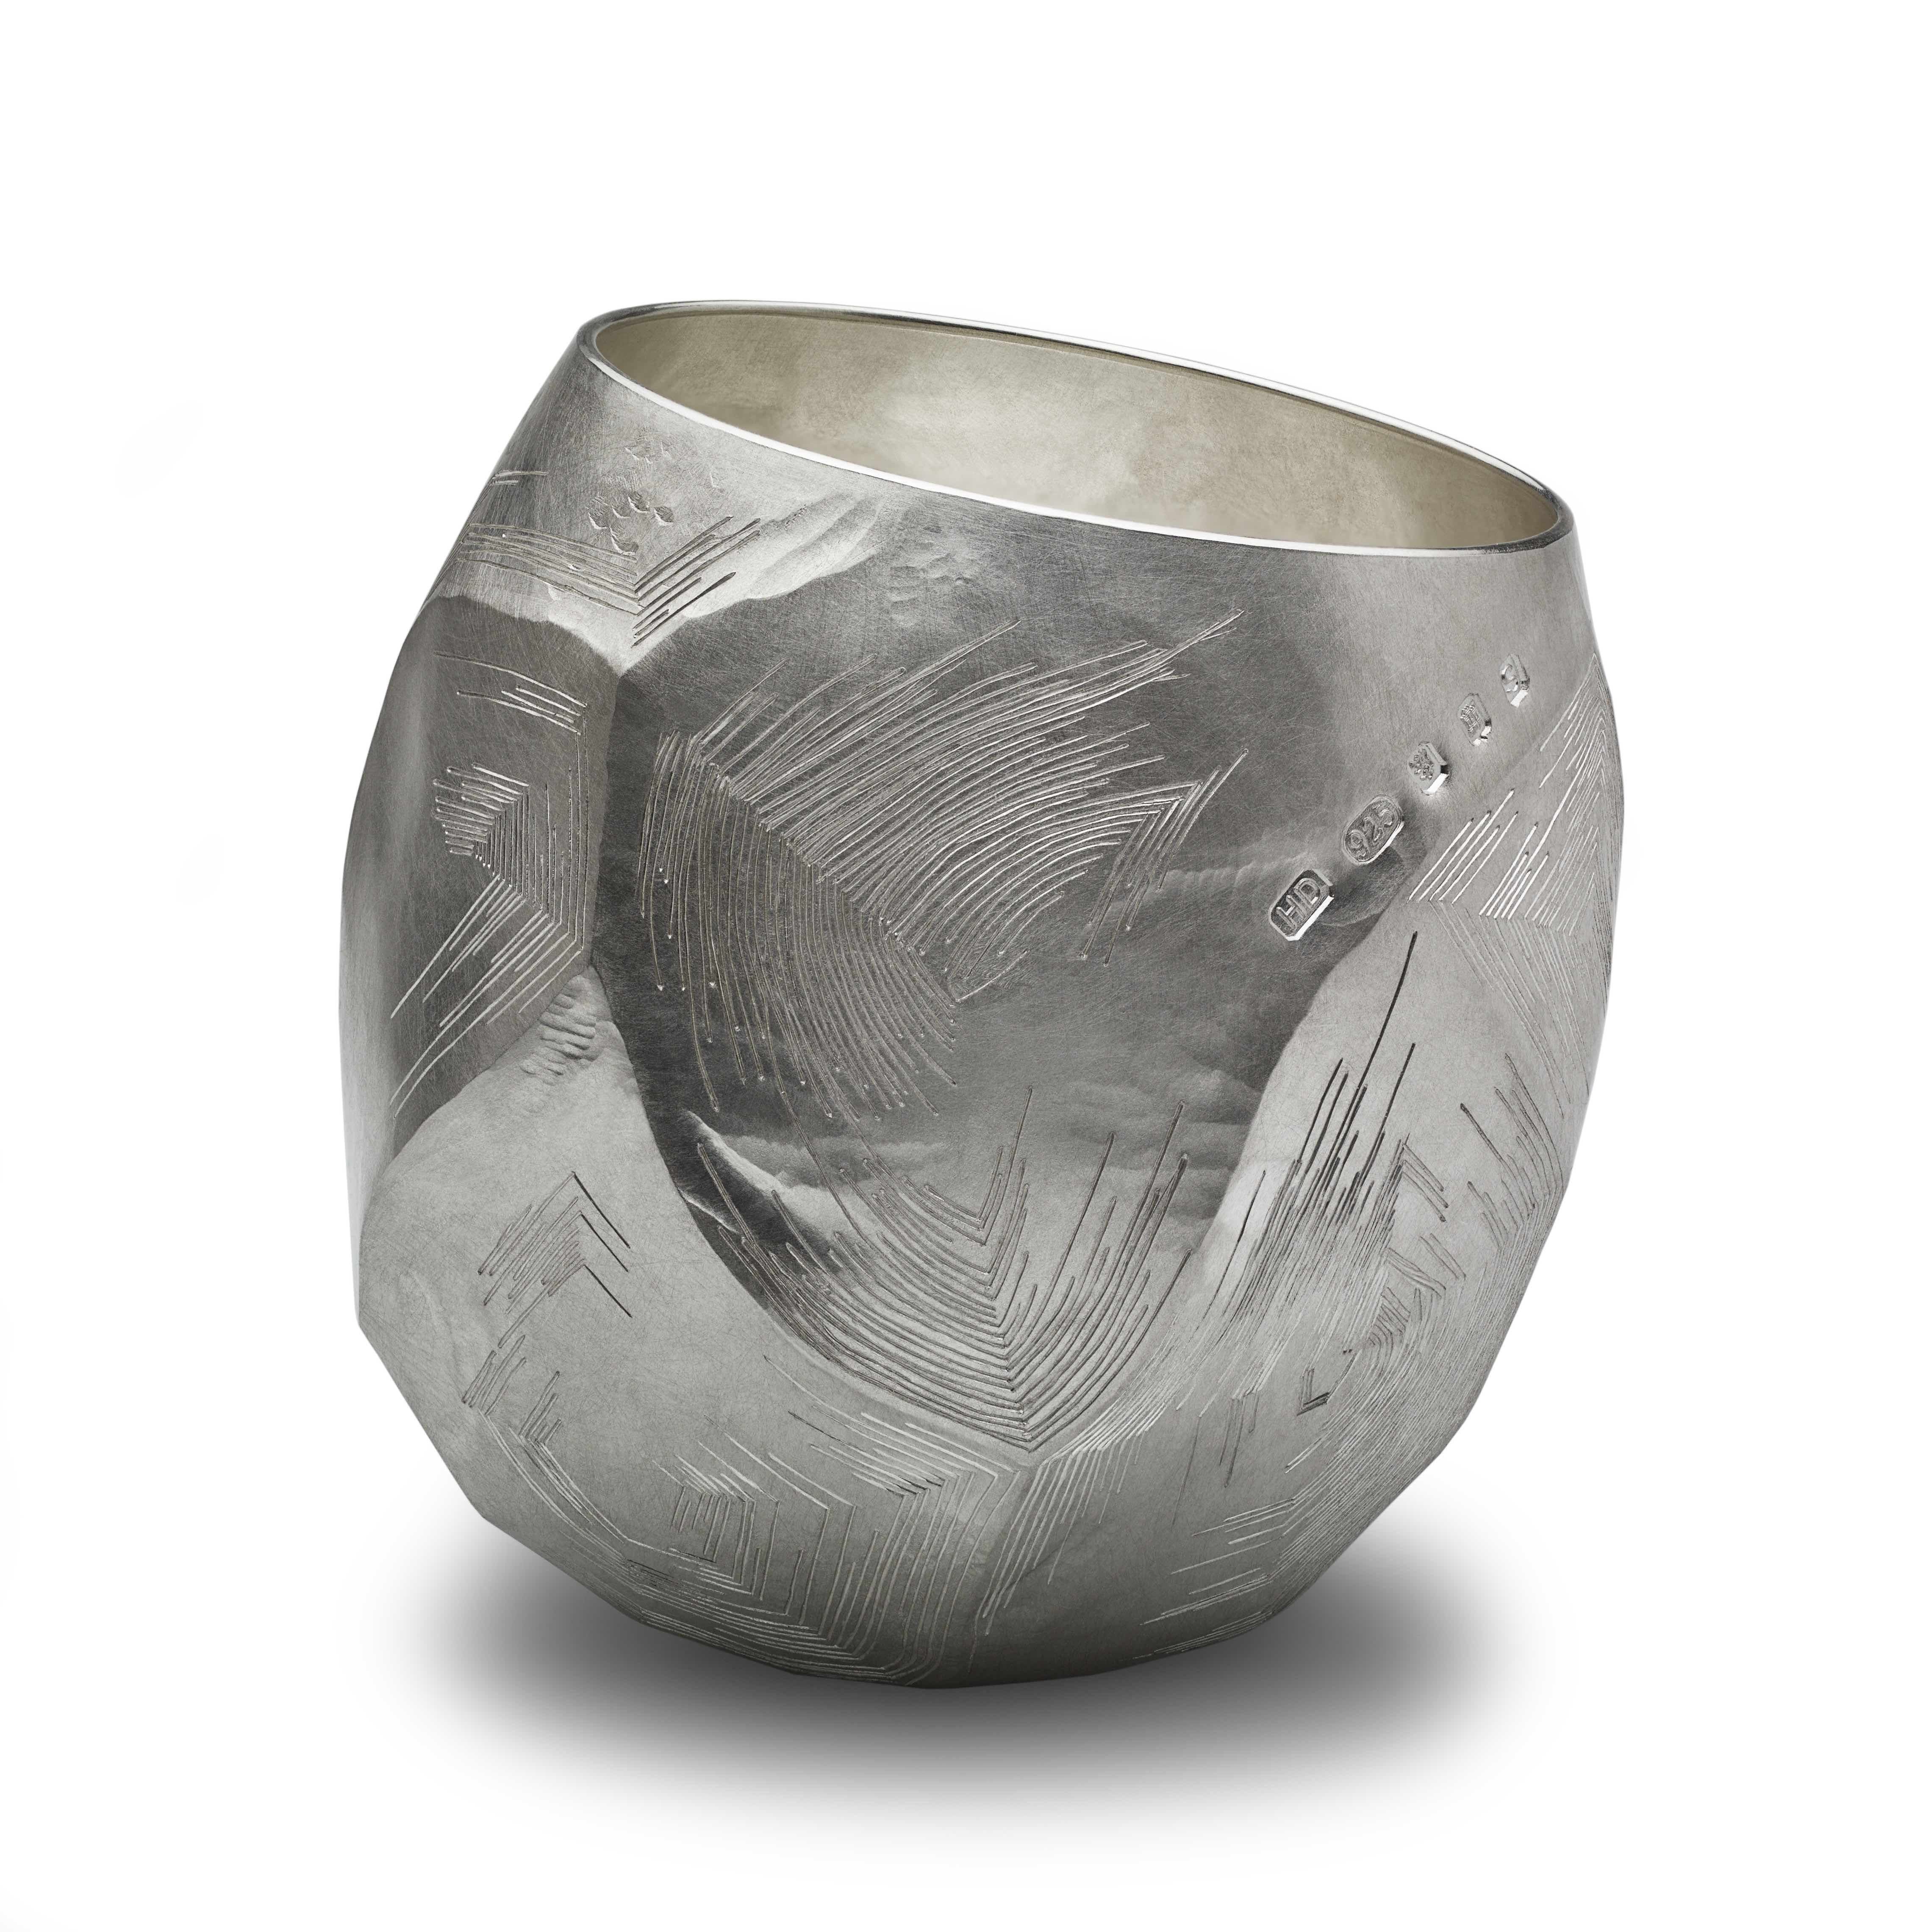 Engraved Quarried Tumbler